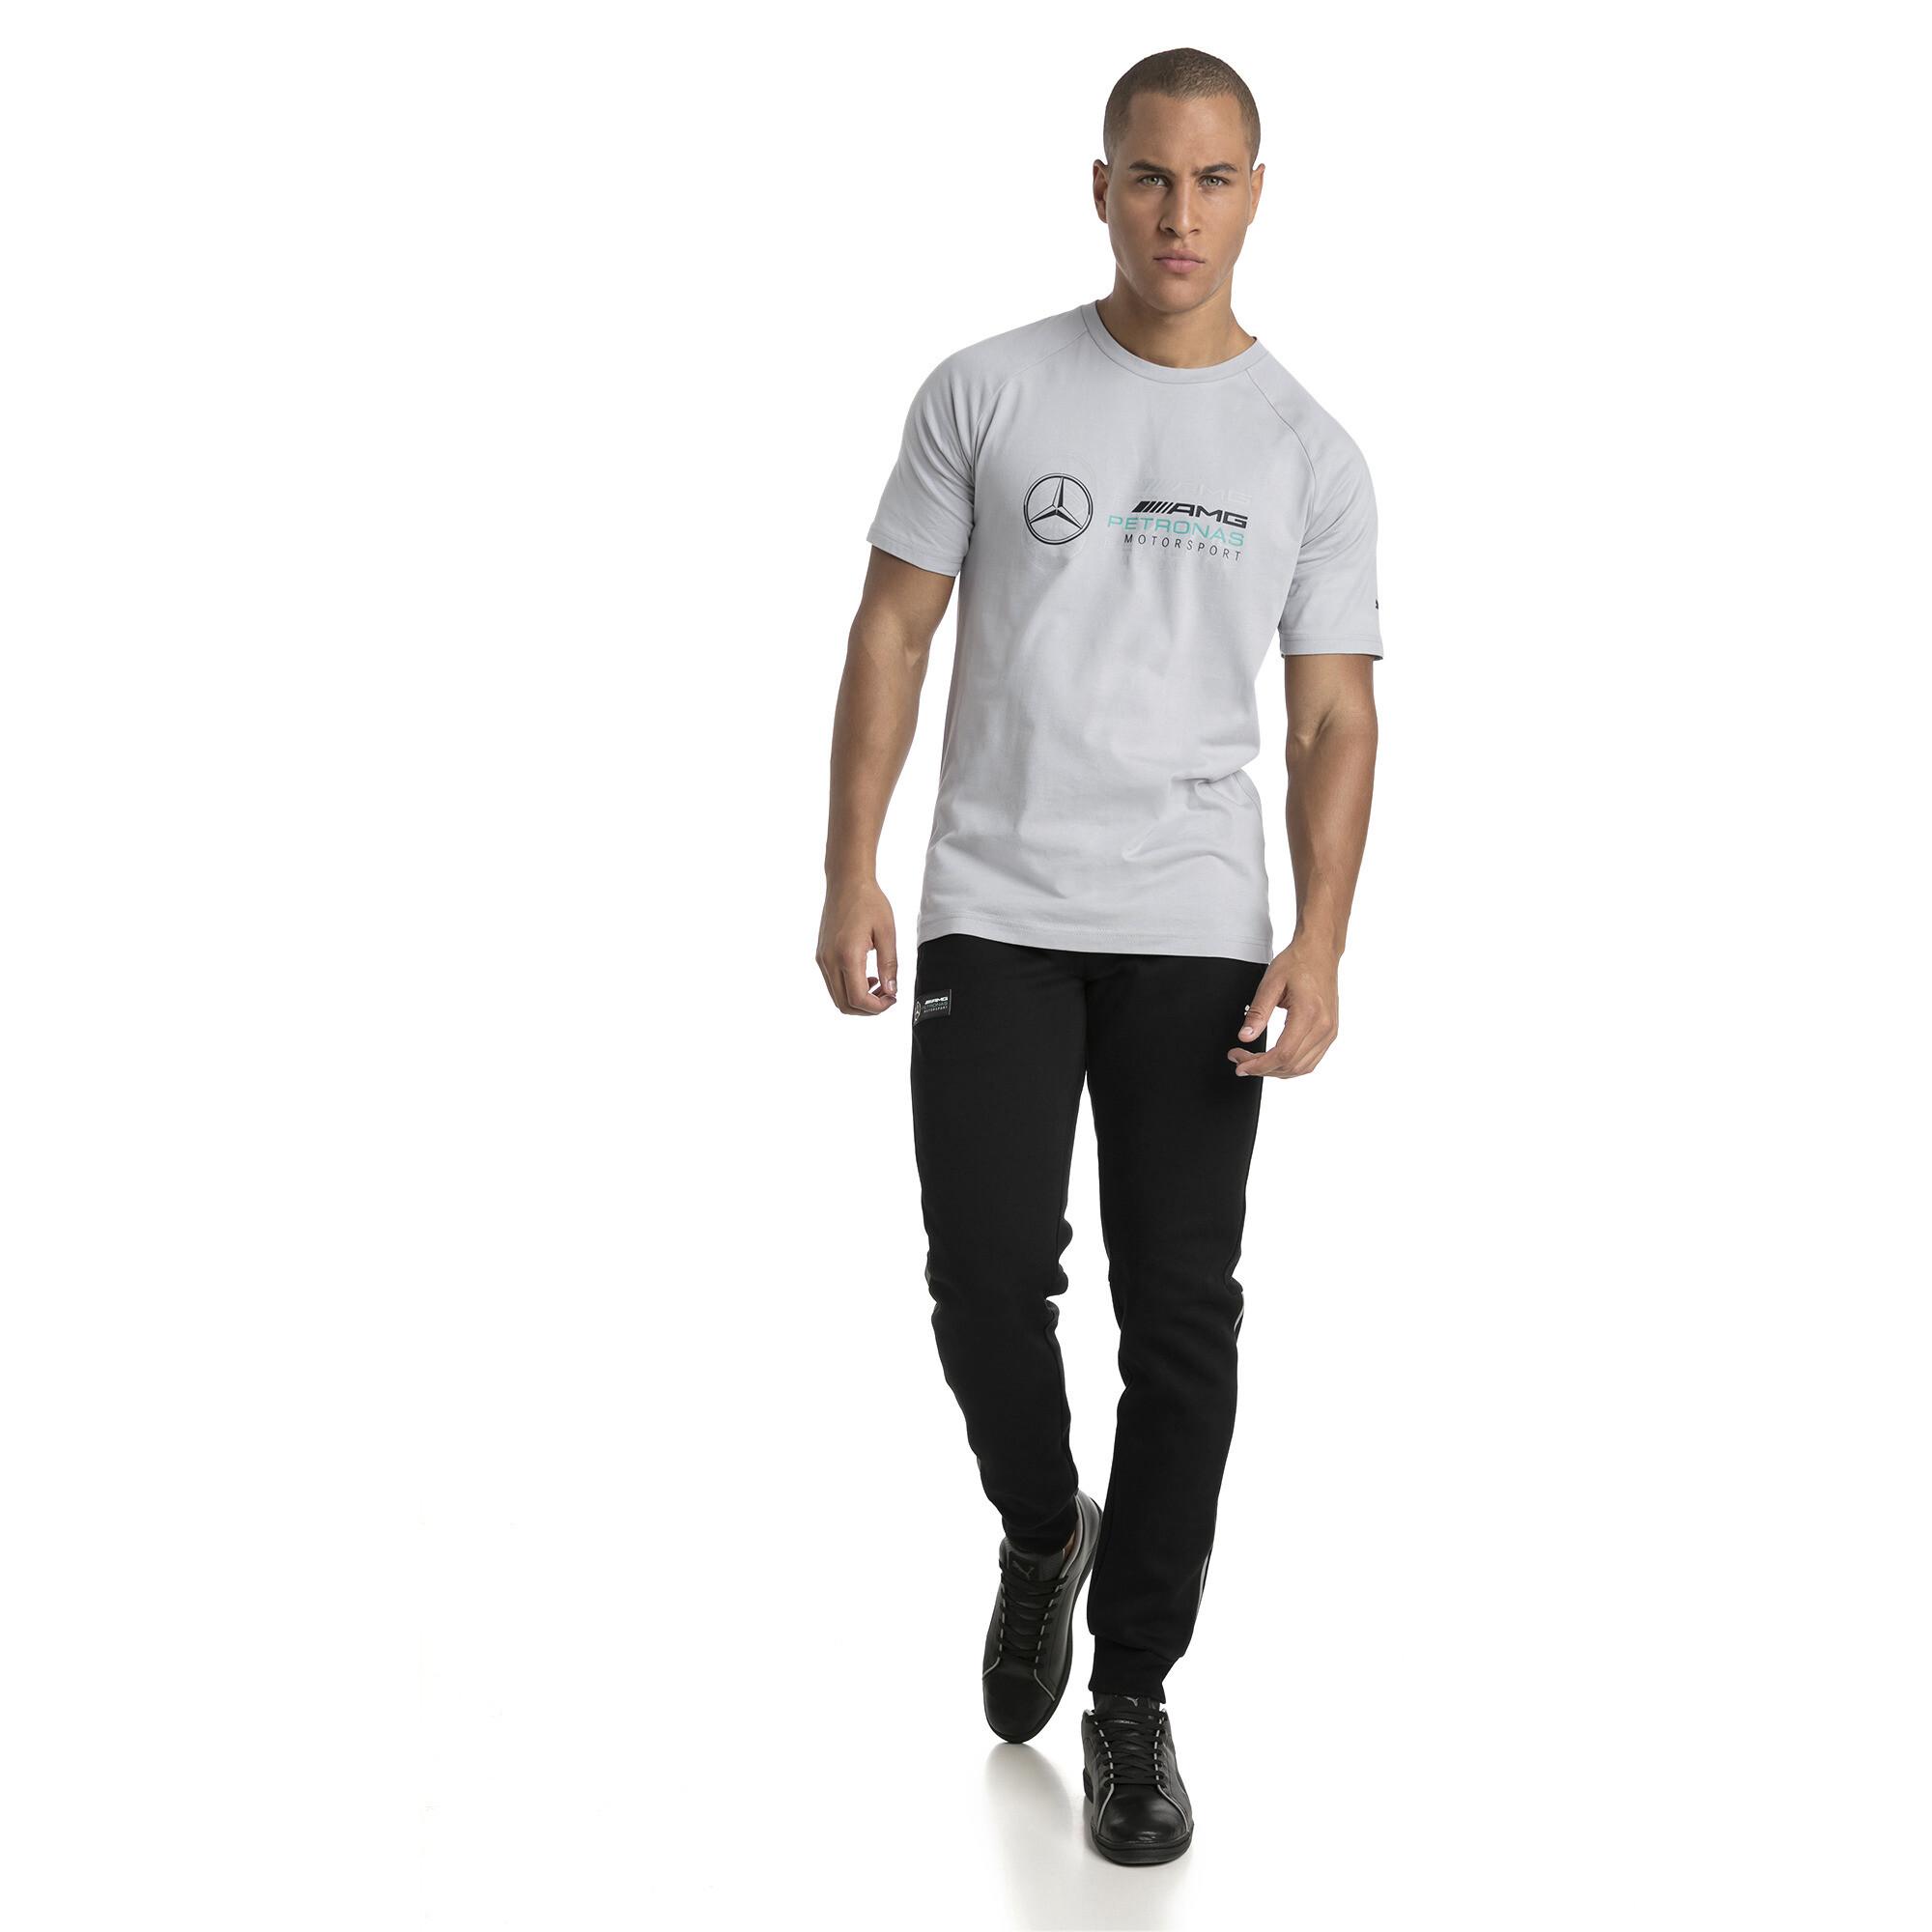 Image Puma MERCEDES AMG PETRONAS Men's Logo T-Shirt #3